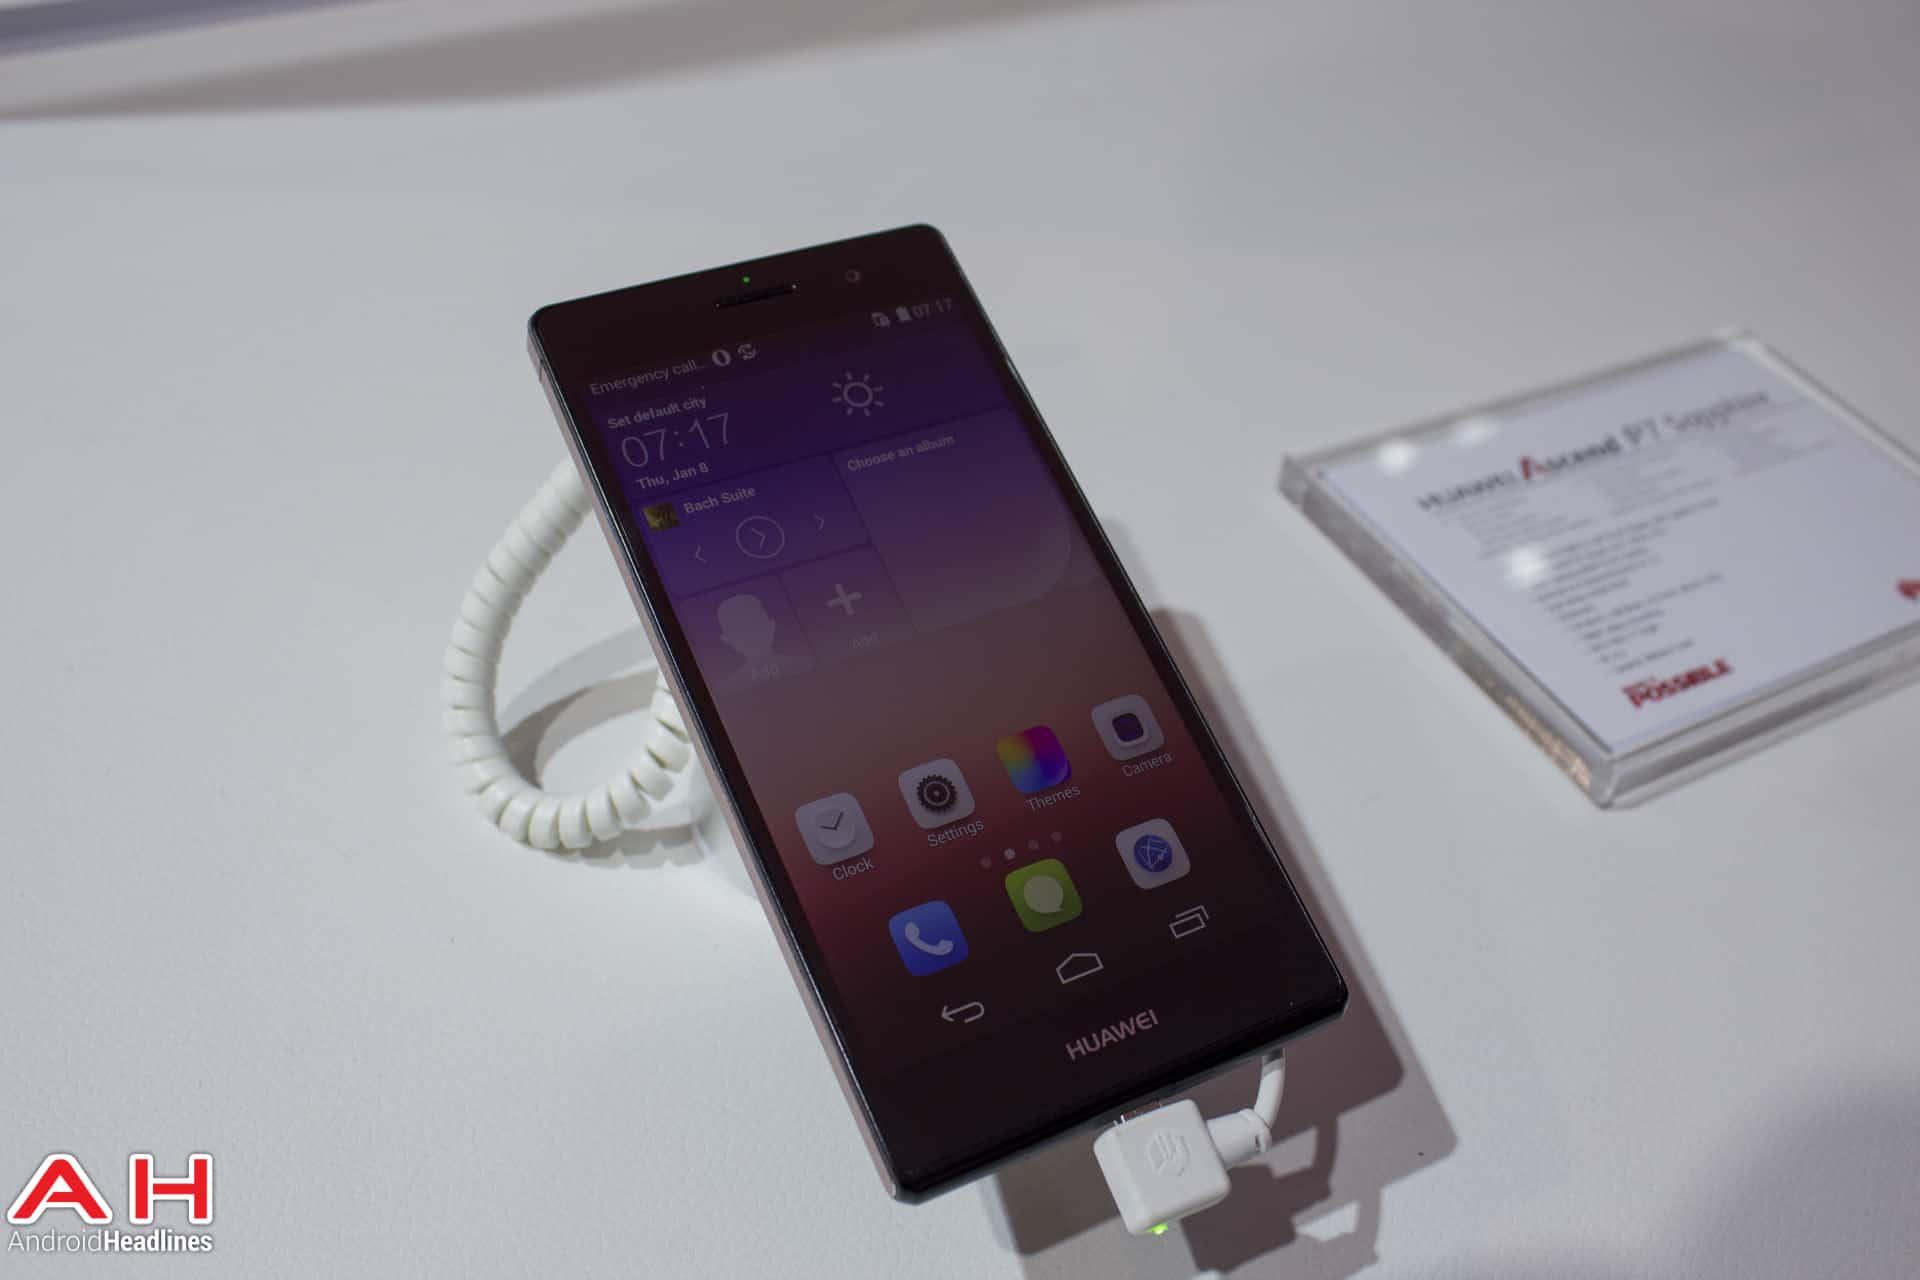 Huawei Ascend P7 AH 3